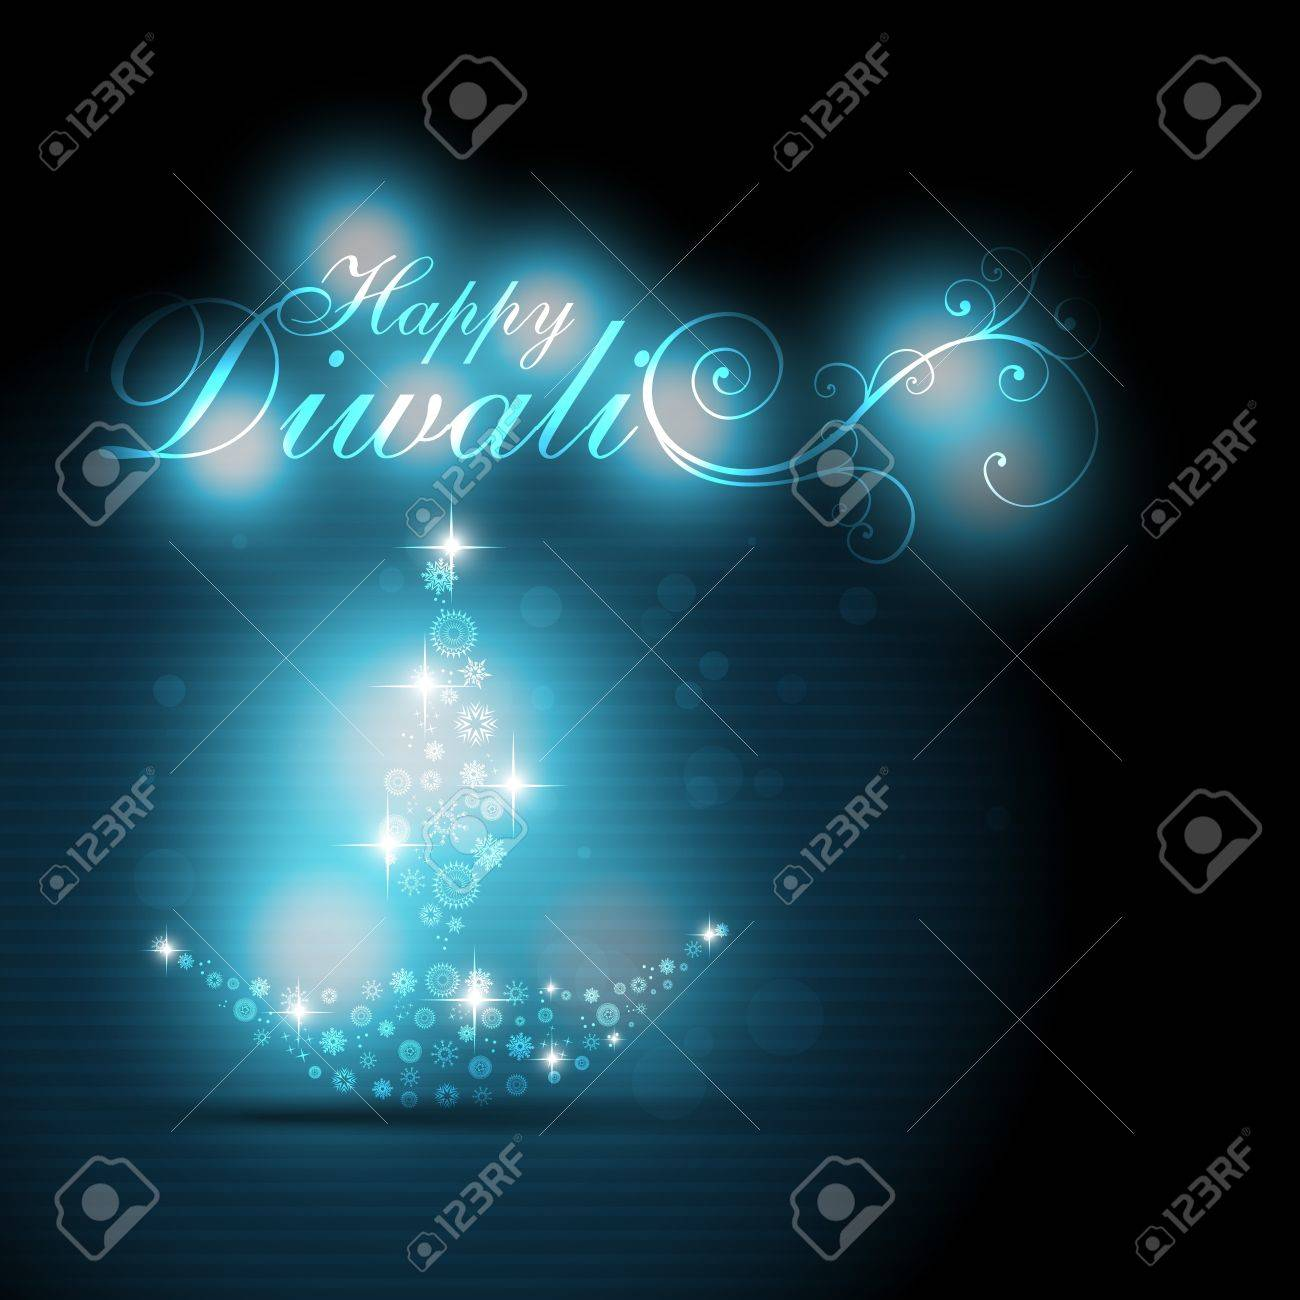 artistic diwali diya on glowing blue background Stock Vector - 11004443